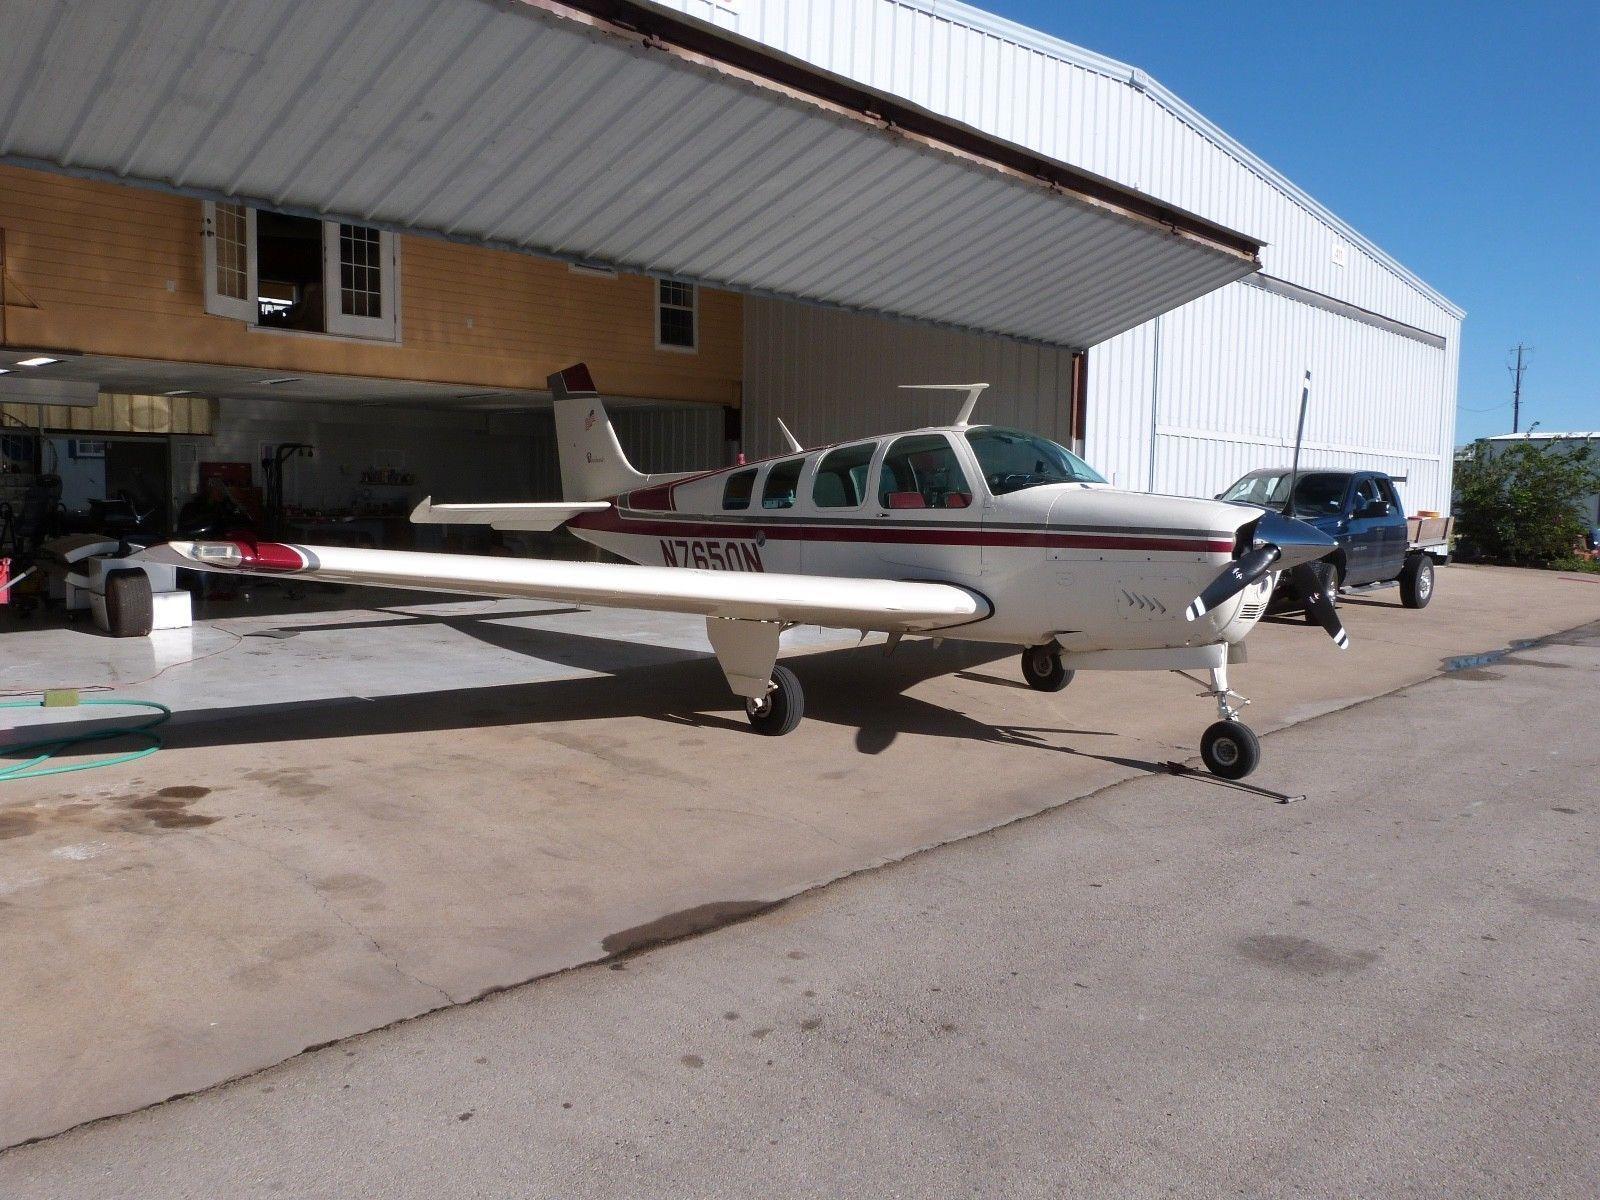 solid 1968 Beechcraft Bonanza 36 aircraft for sale